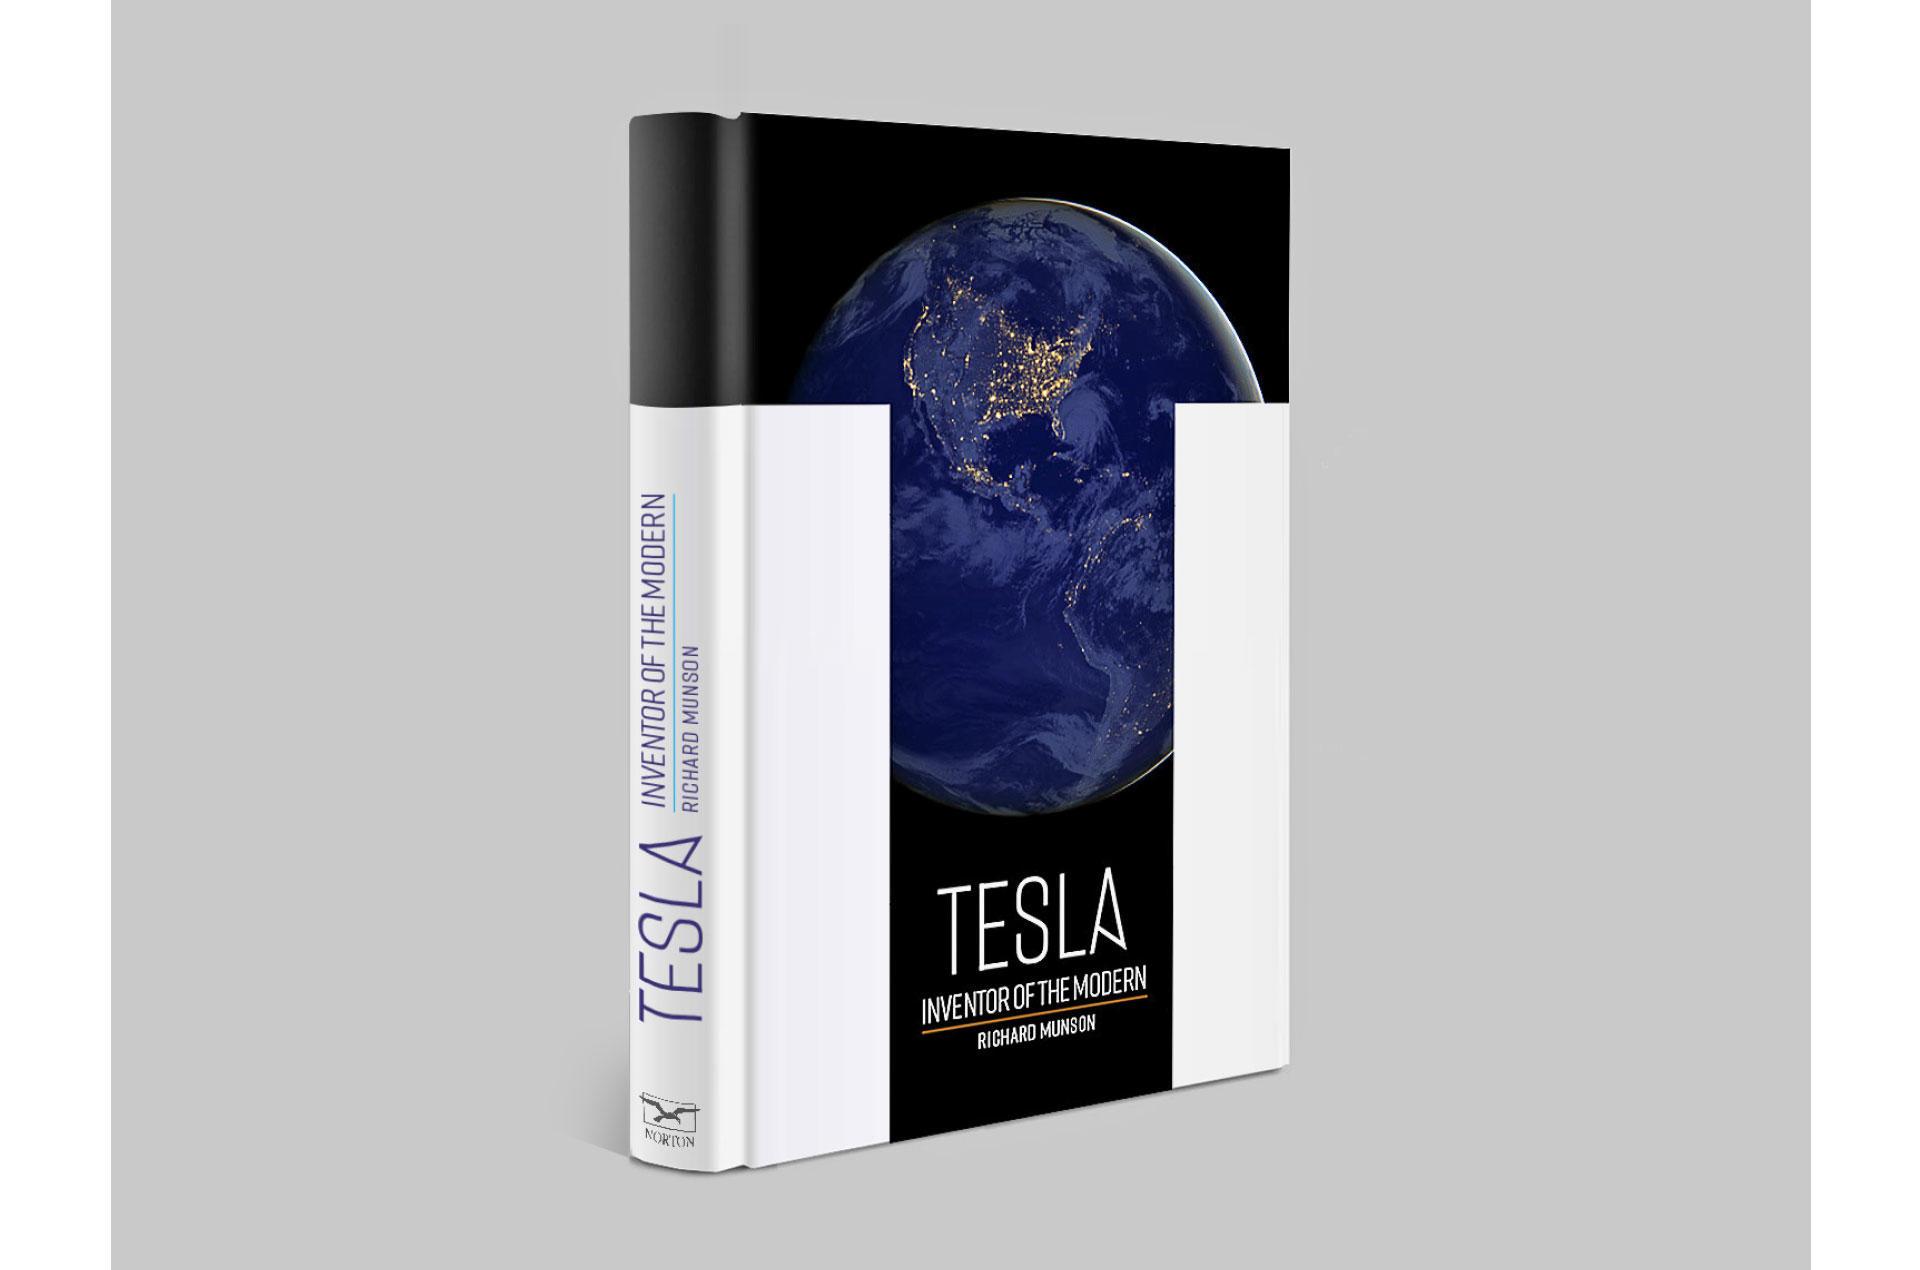 Tesla-comps-A.jpg